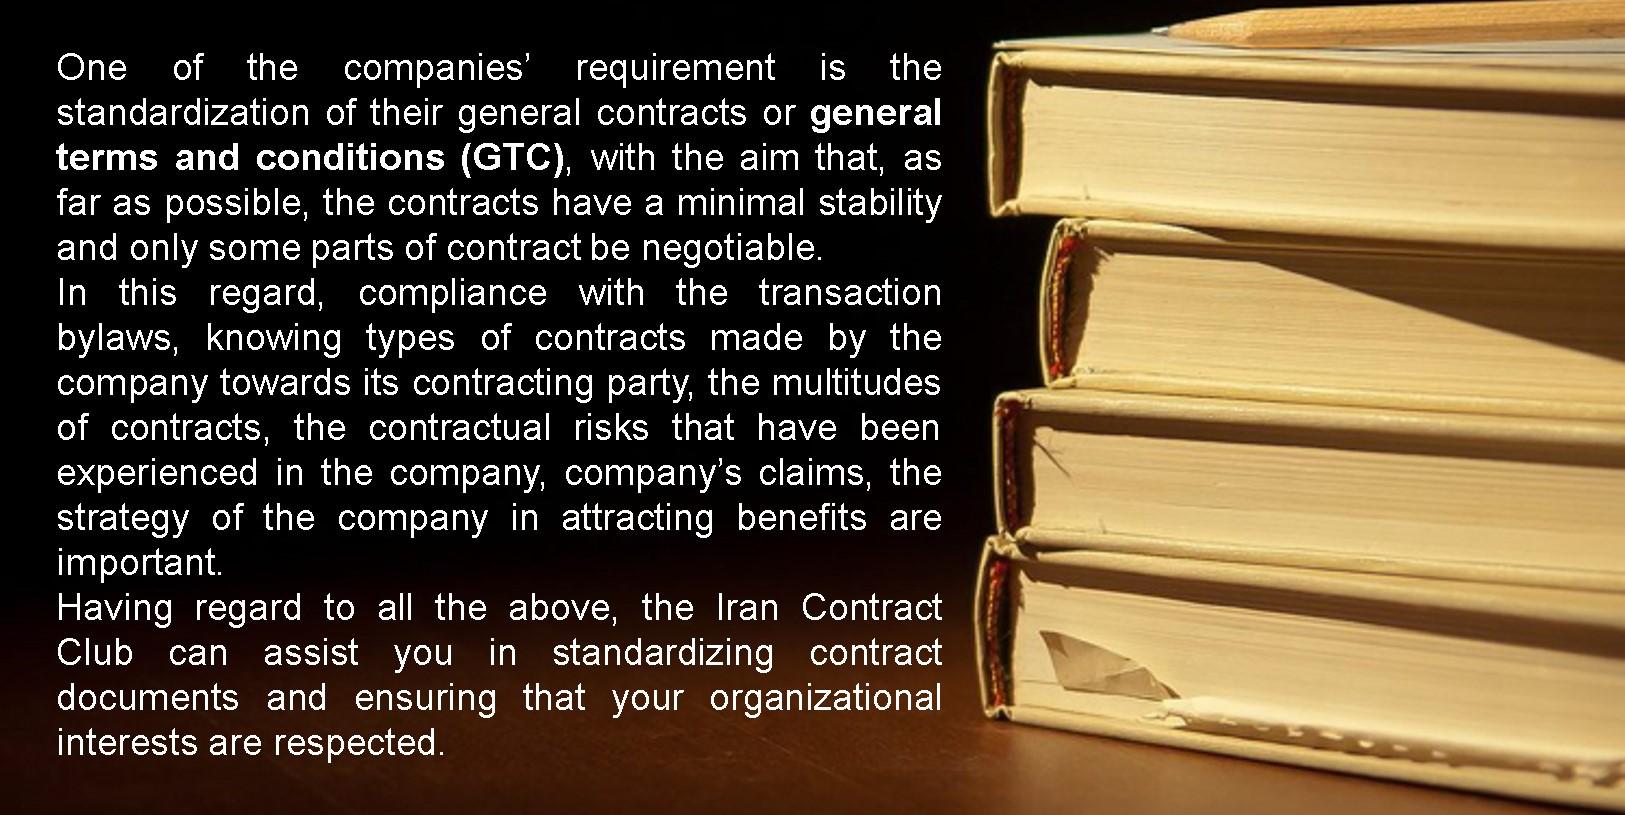 establishment of contract standards-Iran contract club